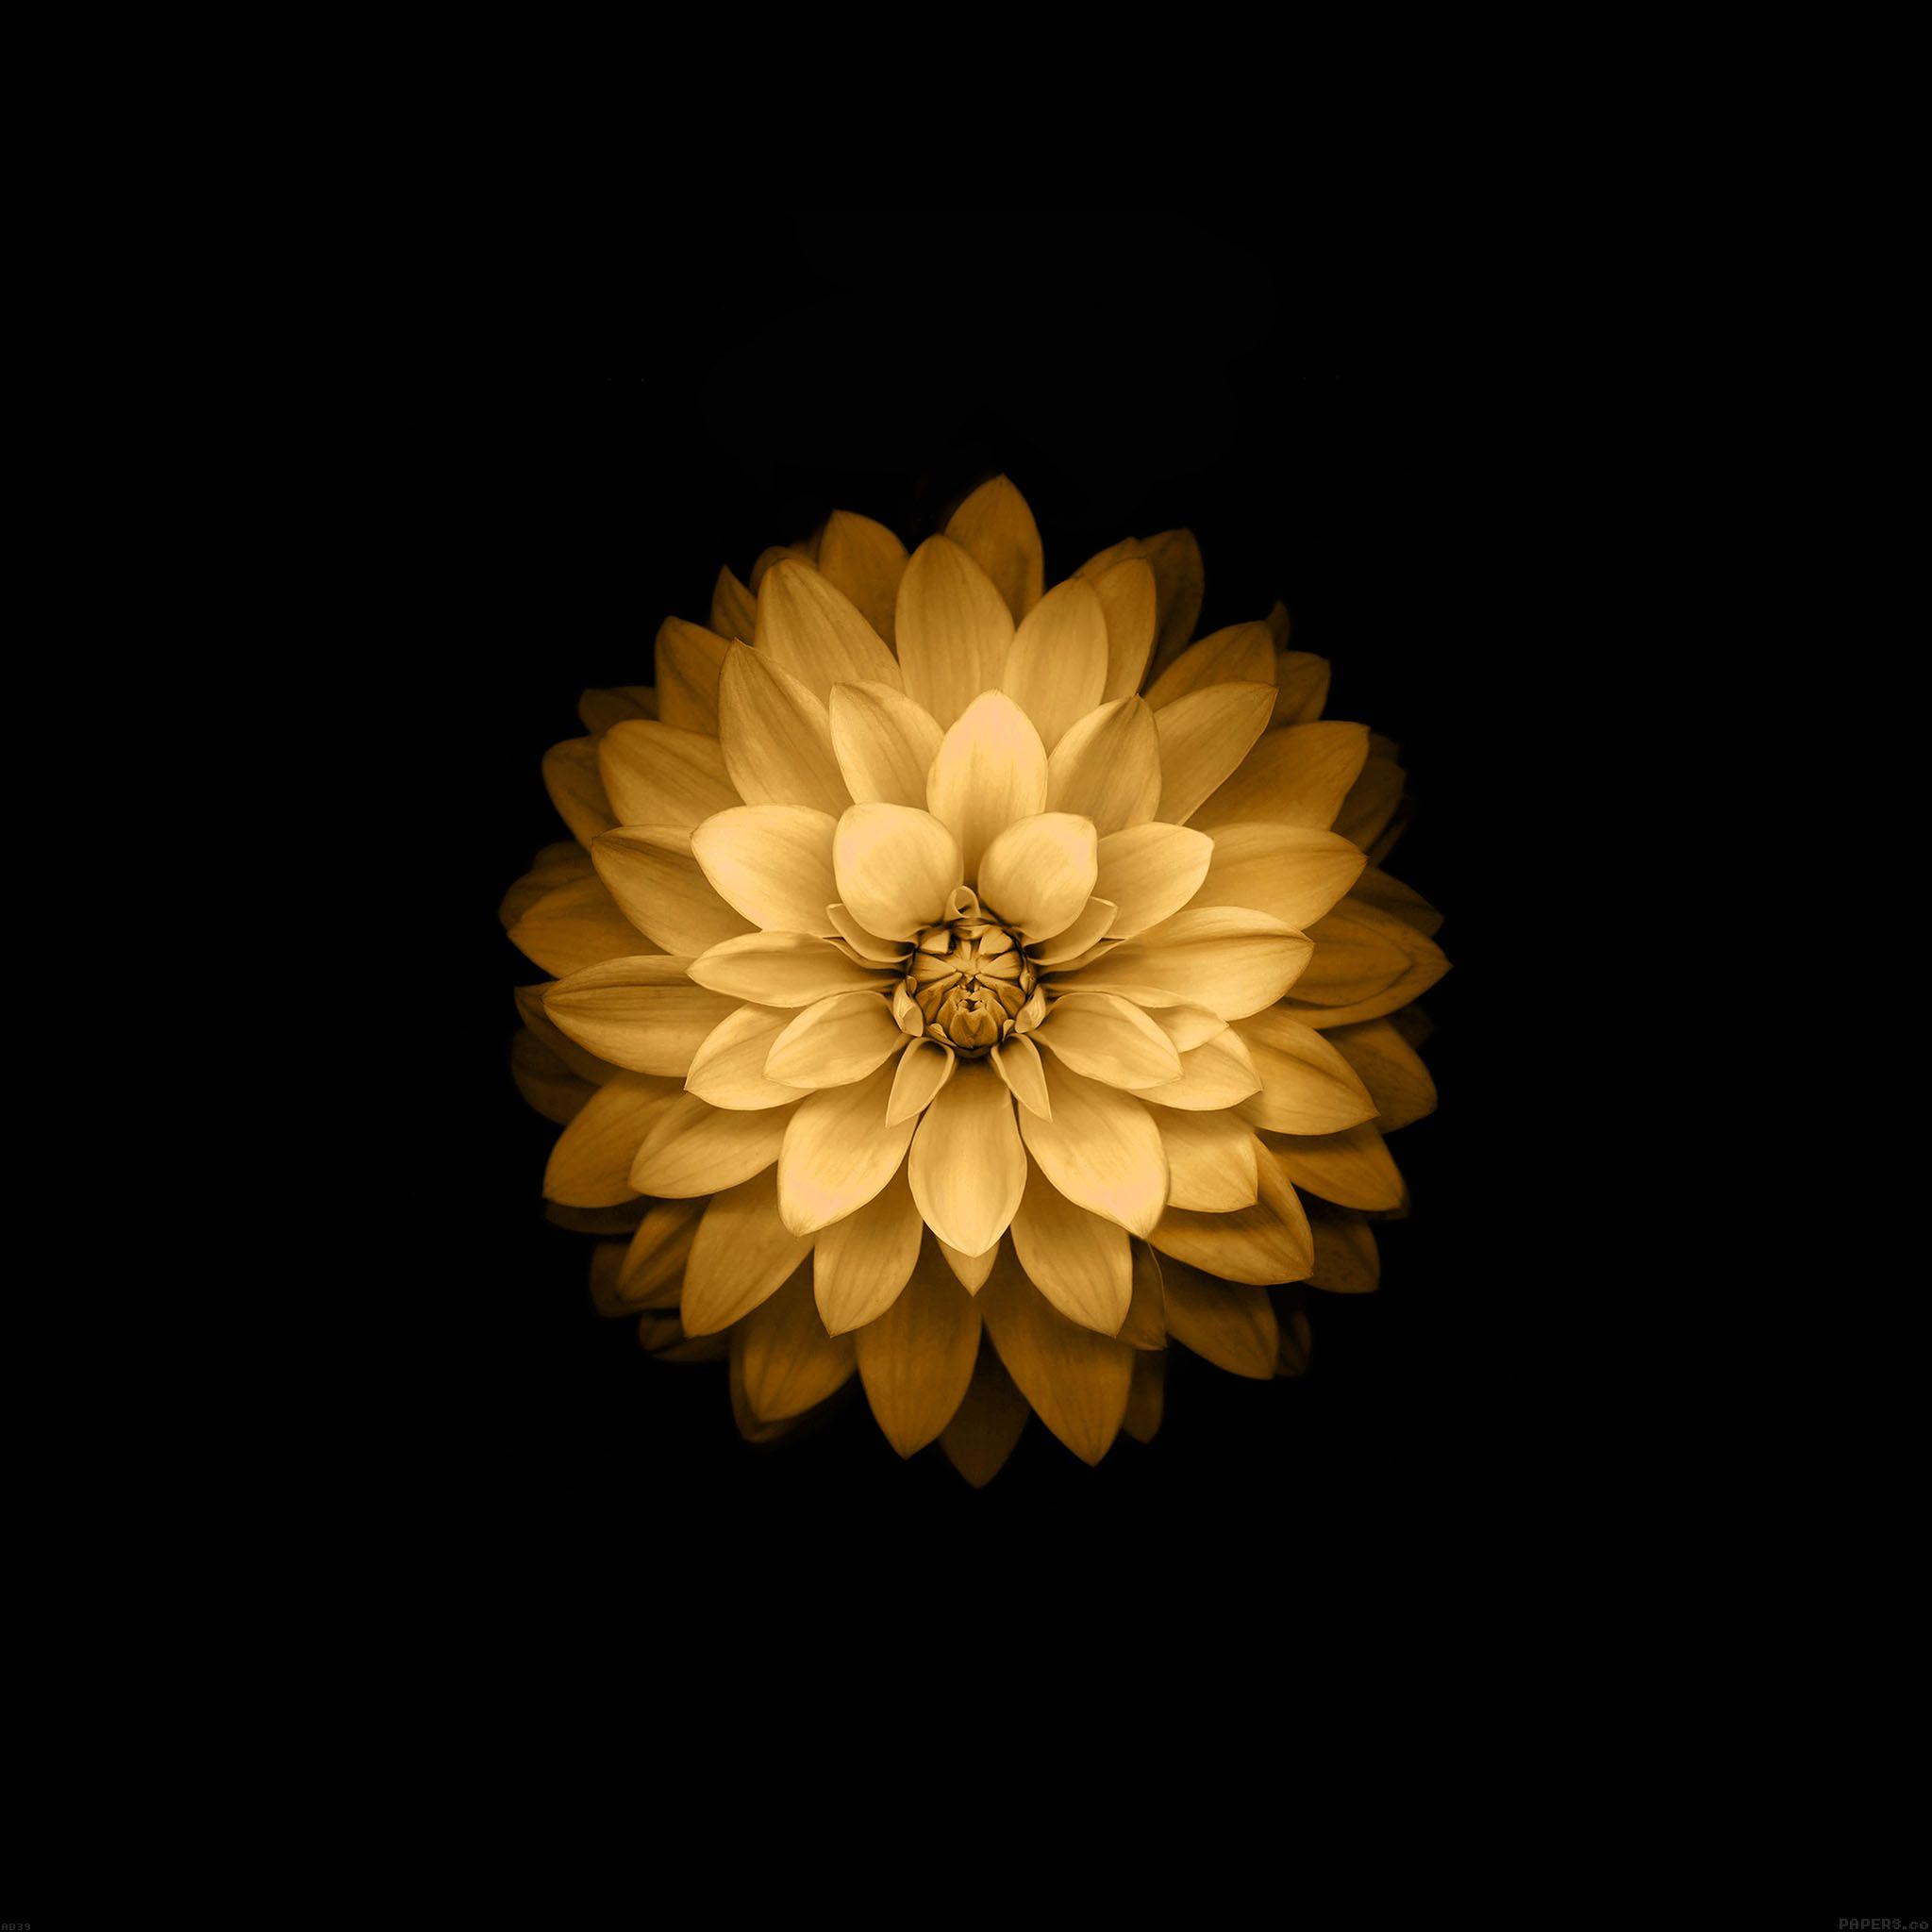 papers.co-ad39-apple-yellow-lotus-iphone6-plus-ios8-flower-8-wallpaper.jpg 2,048×2,048픽셀